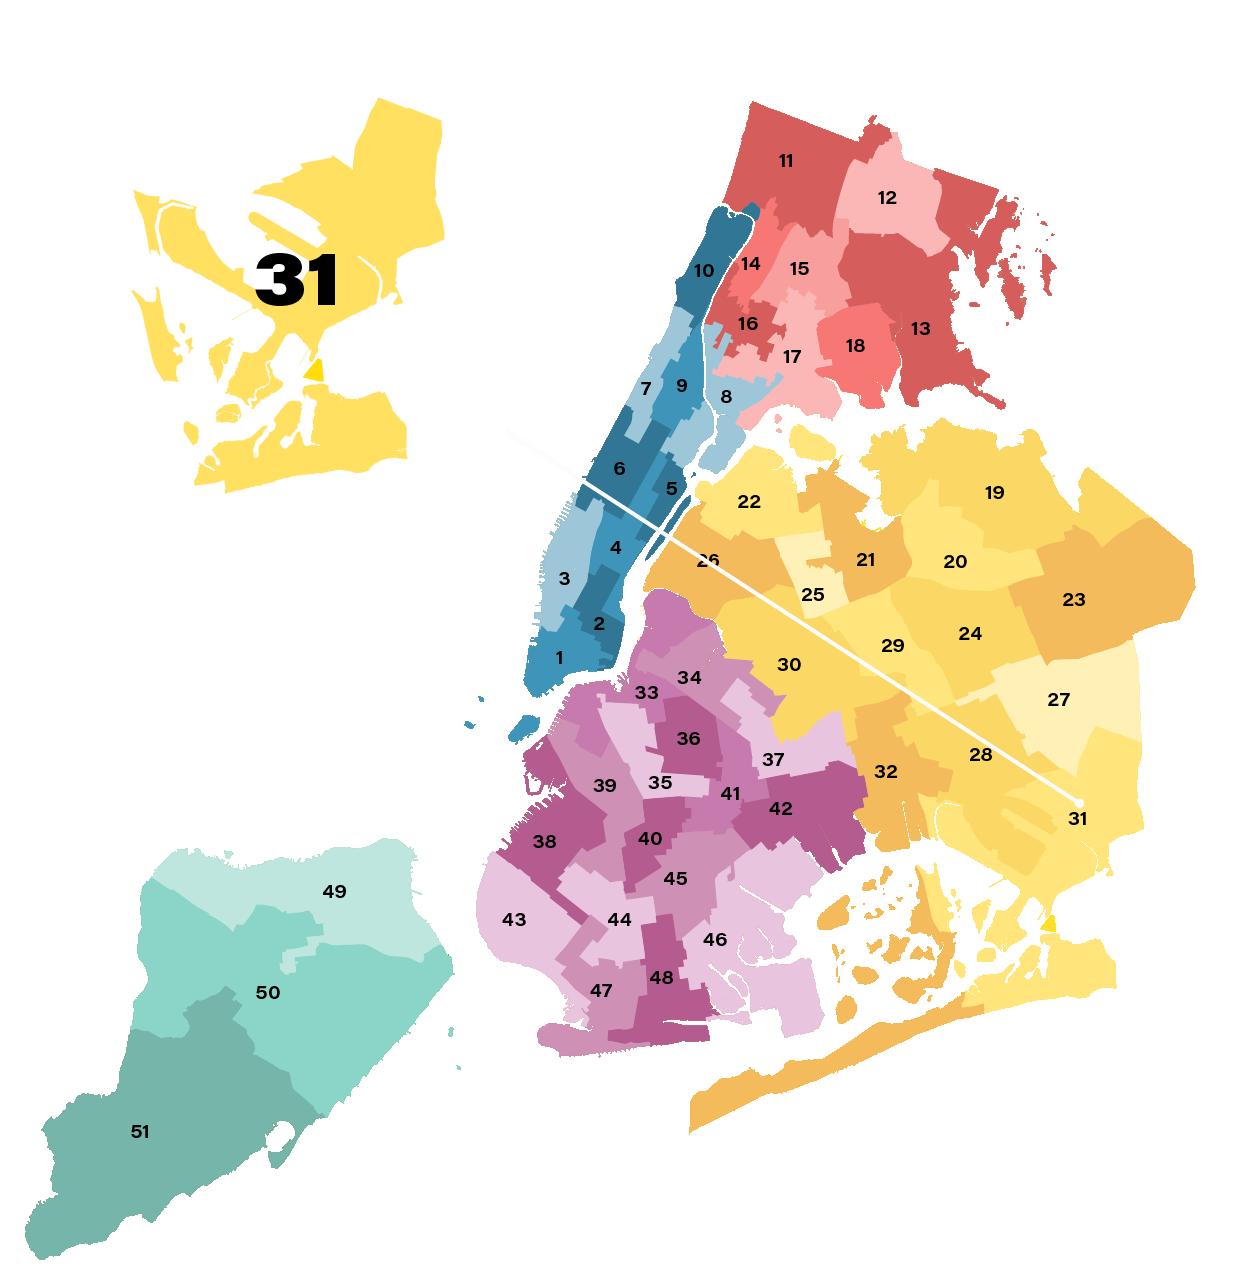 New York City District 31 Map